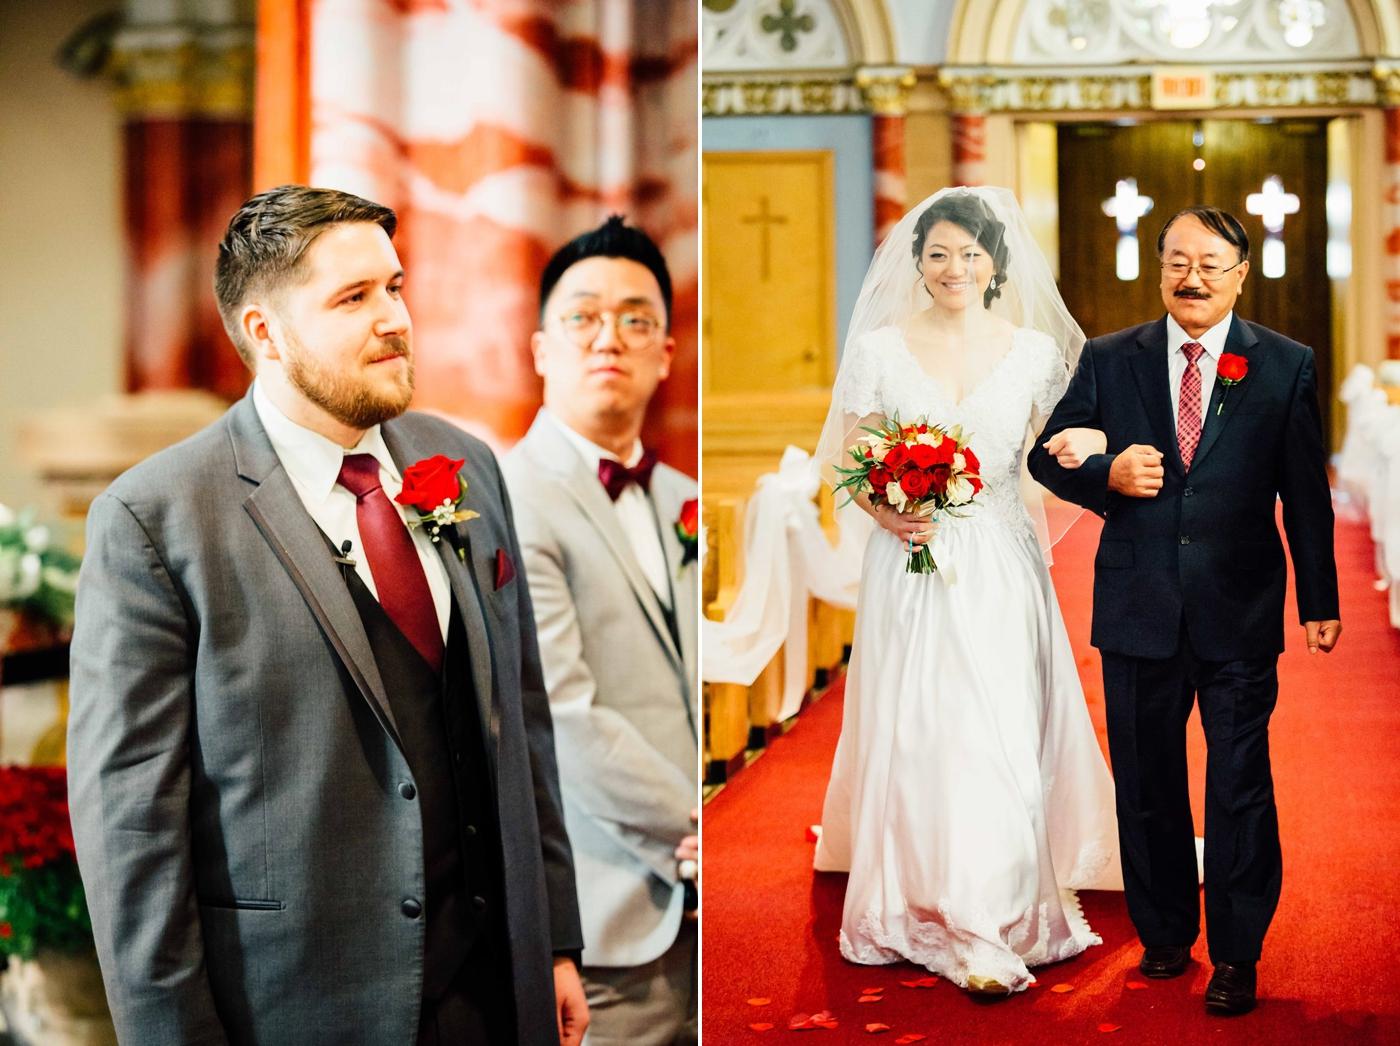 chicago-fine-art-wedding-photography-bolotin22